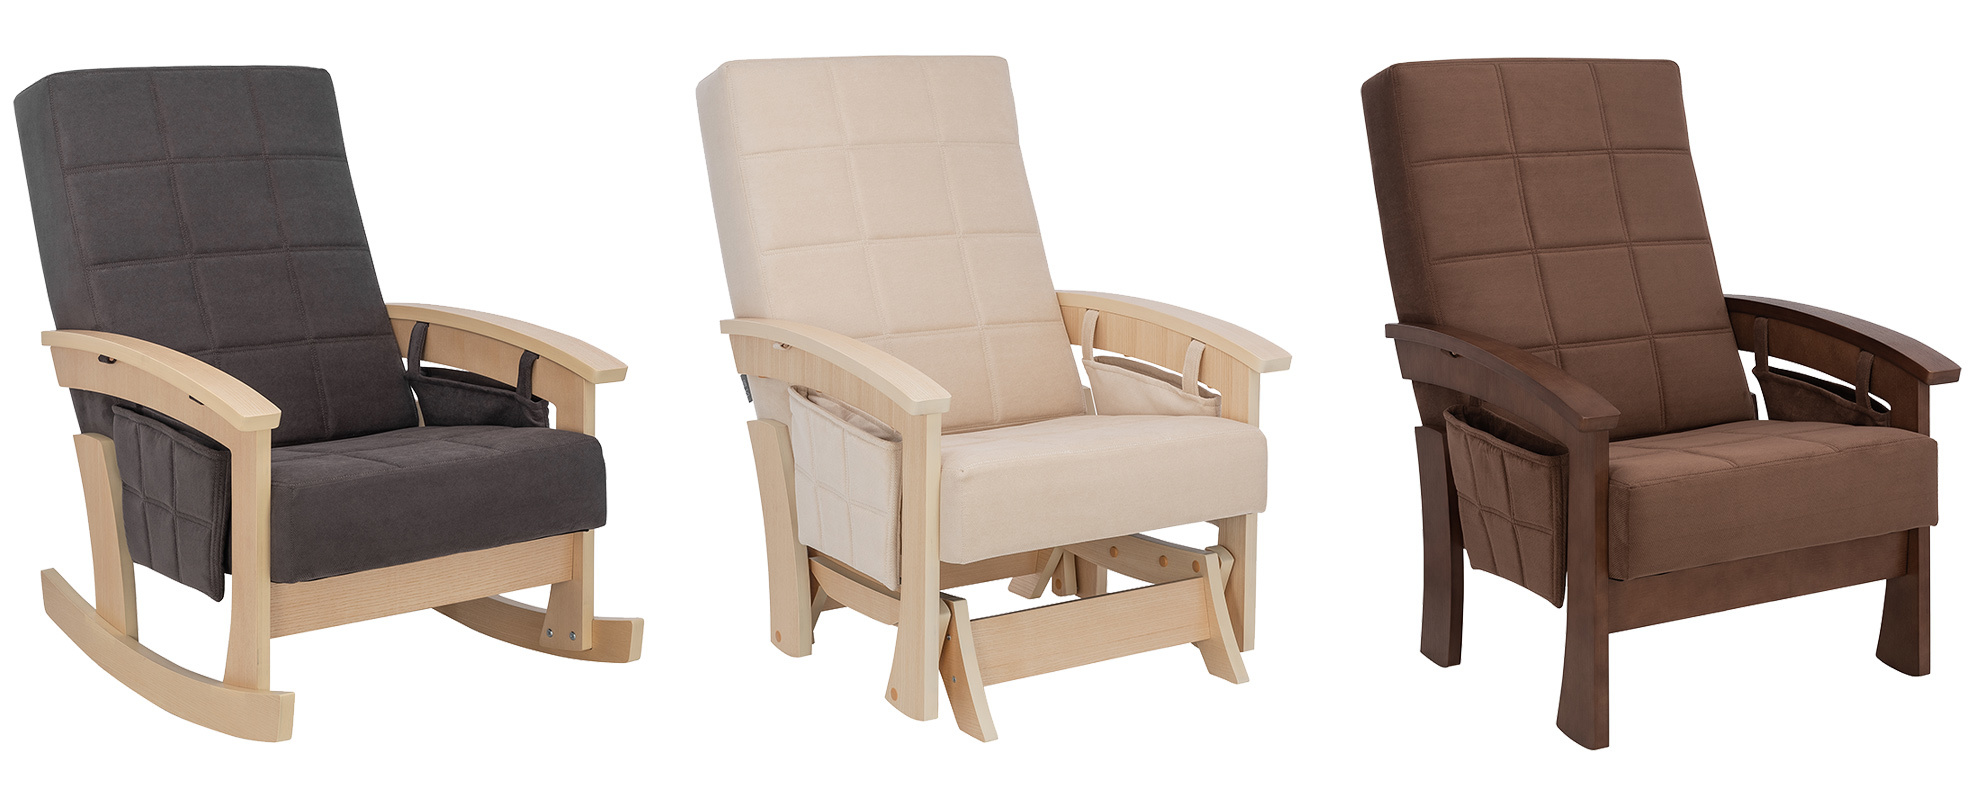 Новинки – скандинавские кресла и качалки!